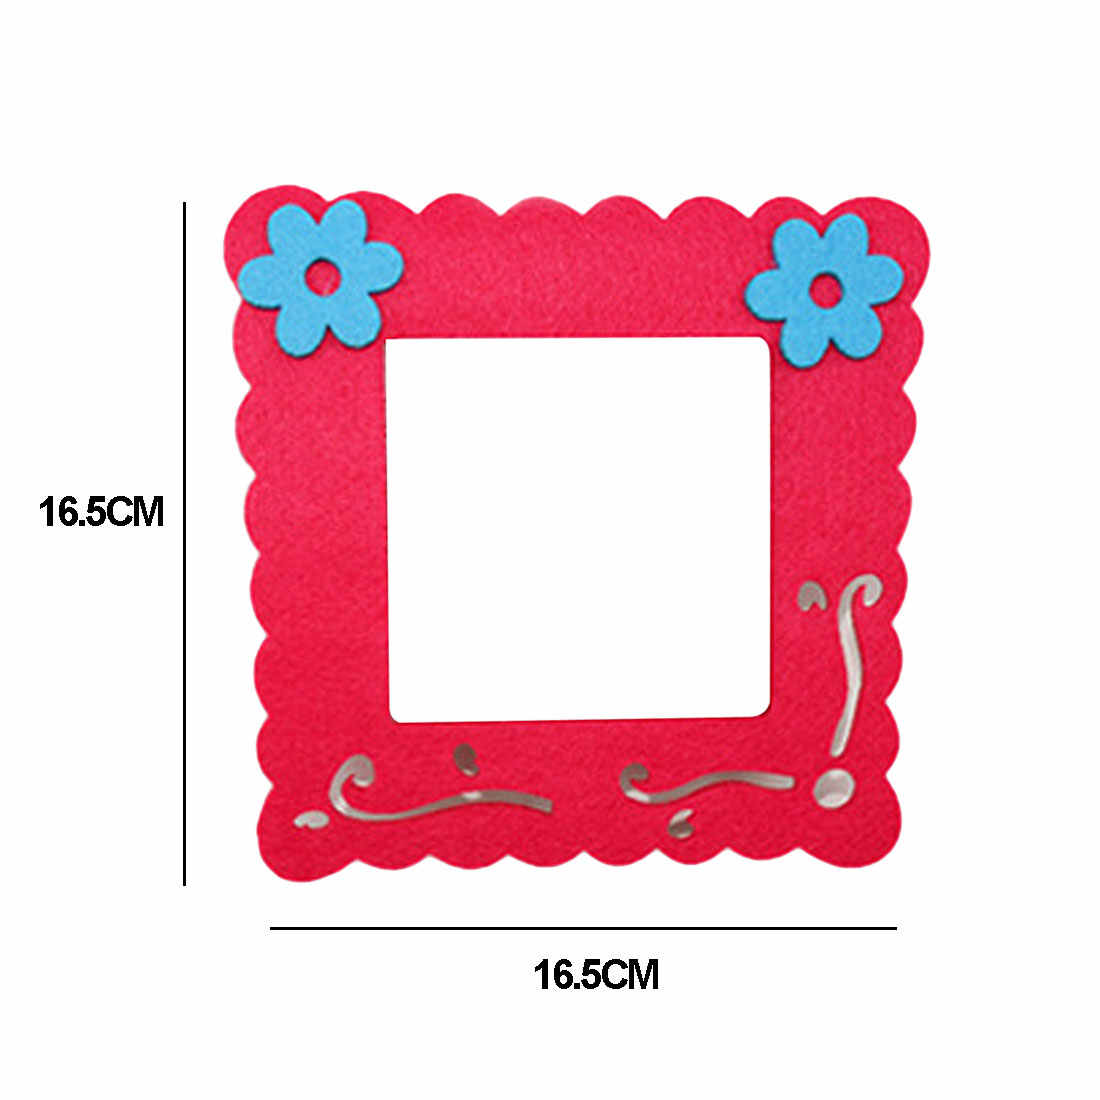 Hewan Lucu Lampu Yang Dapat Dilepas Stiker Merasa Hollow-Out Stiker Dinding untuk Anak-anak Bayi Nursery Rumah Stiker Lukisan Dinding Dekorasi